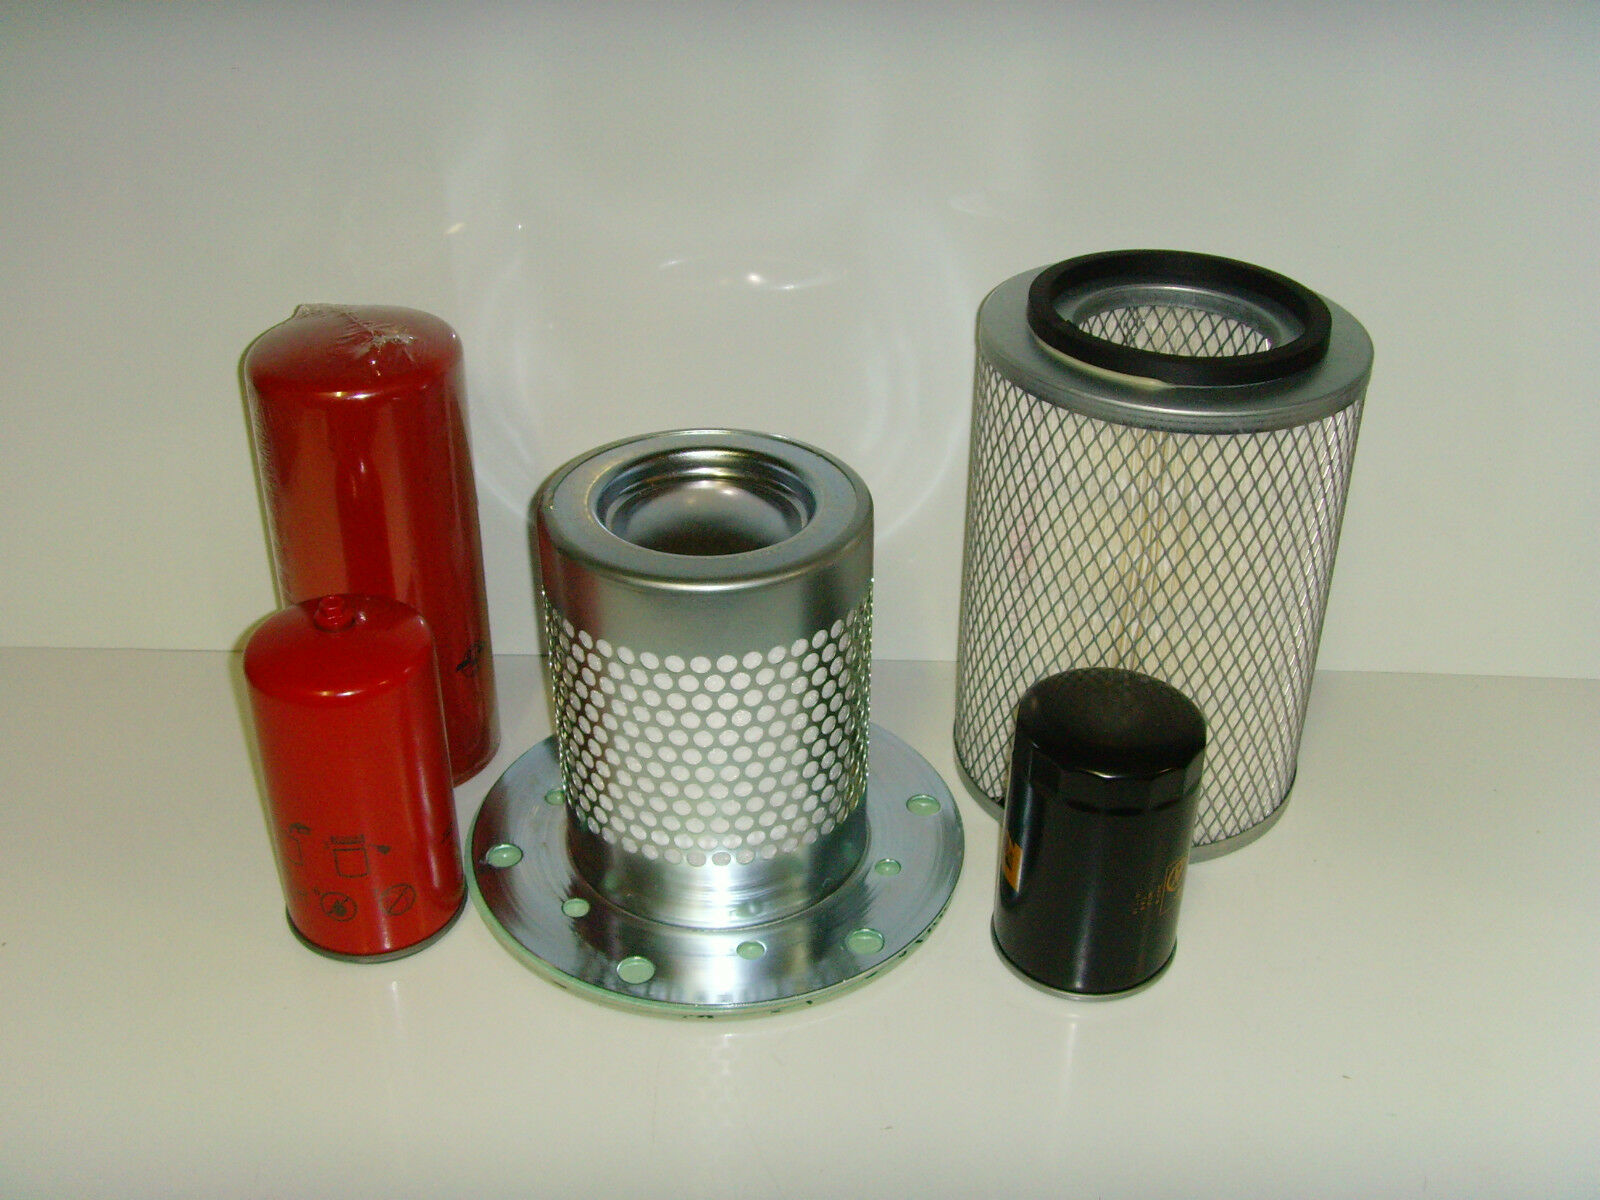 ATLAS COPCO XAS 45 Compressor Filter Service Kit. w/ Deutz F2L1011 Engine